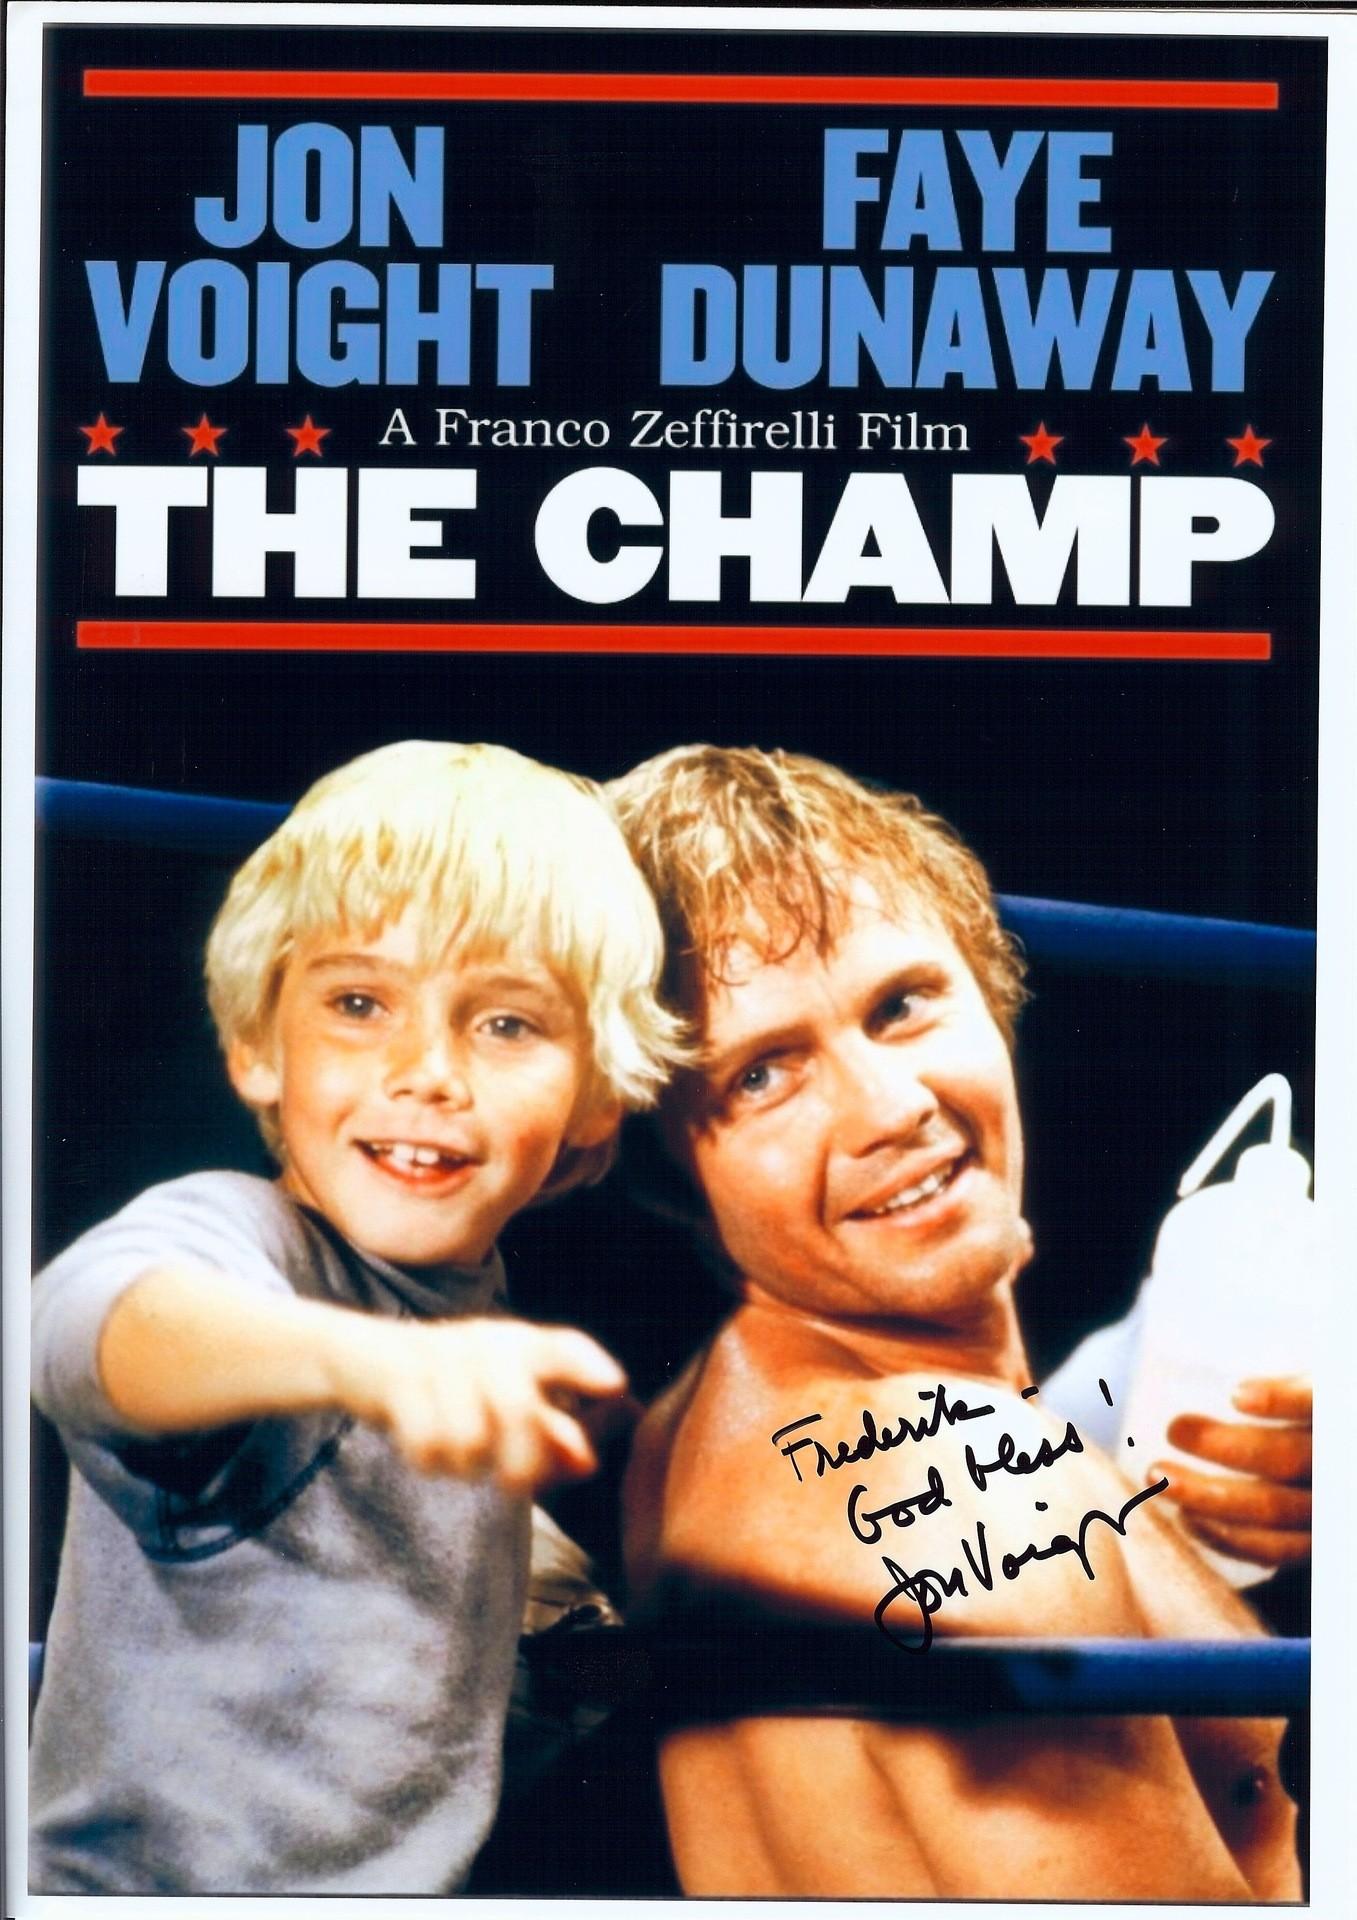 The Champ Movie 1979